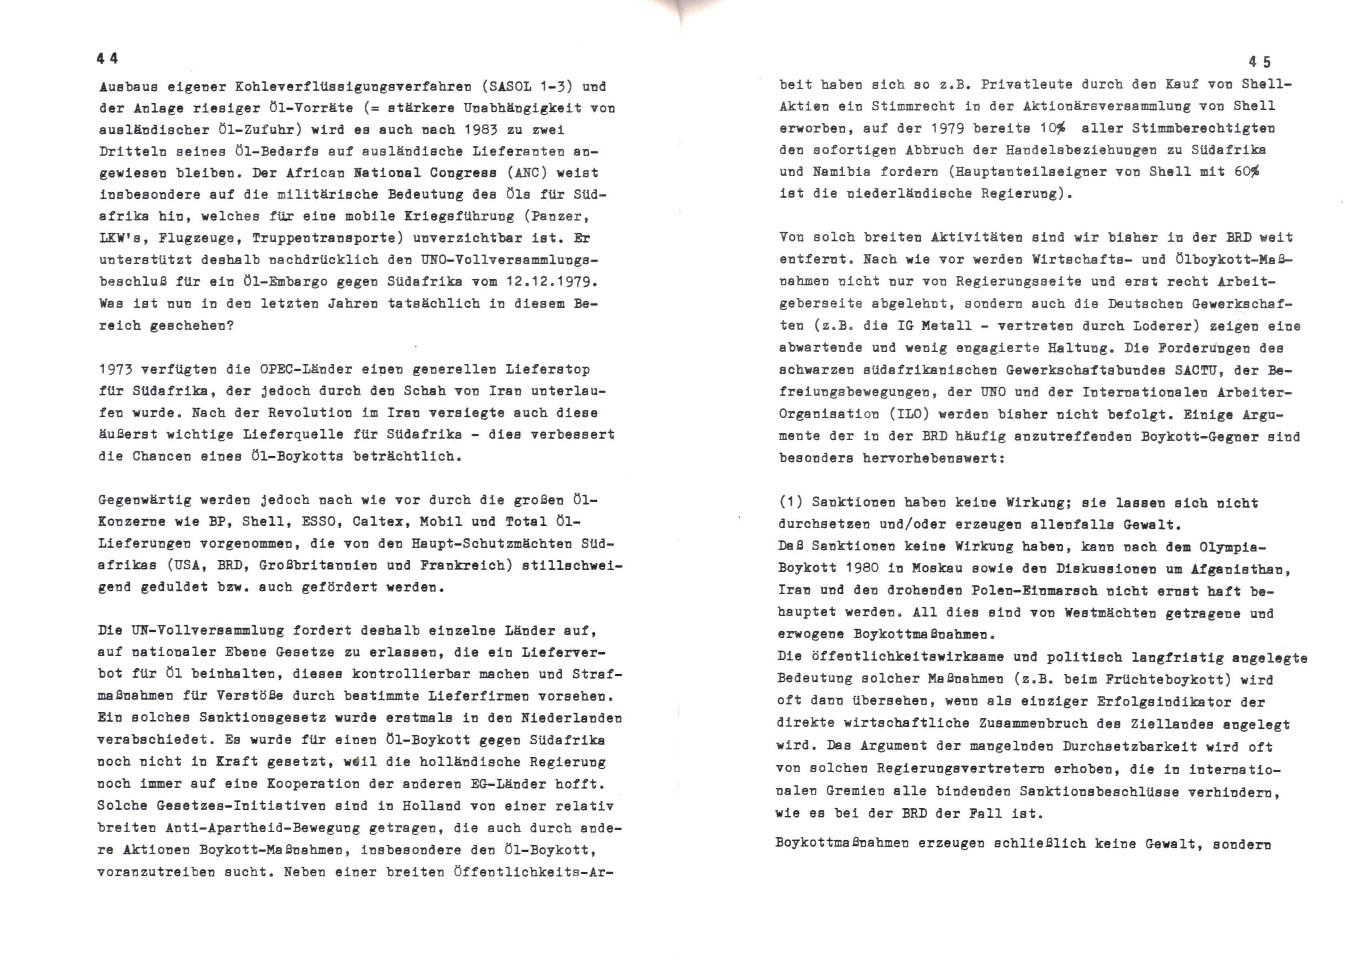 Muenster_AKAFRIK_1981_Suedafrika_BRD_24